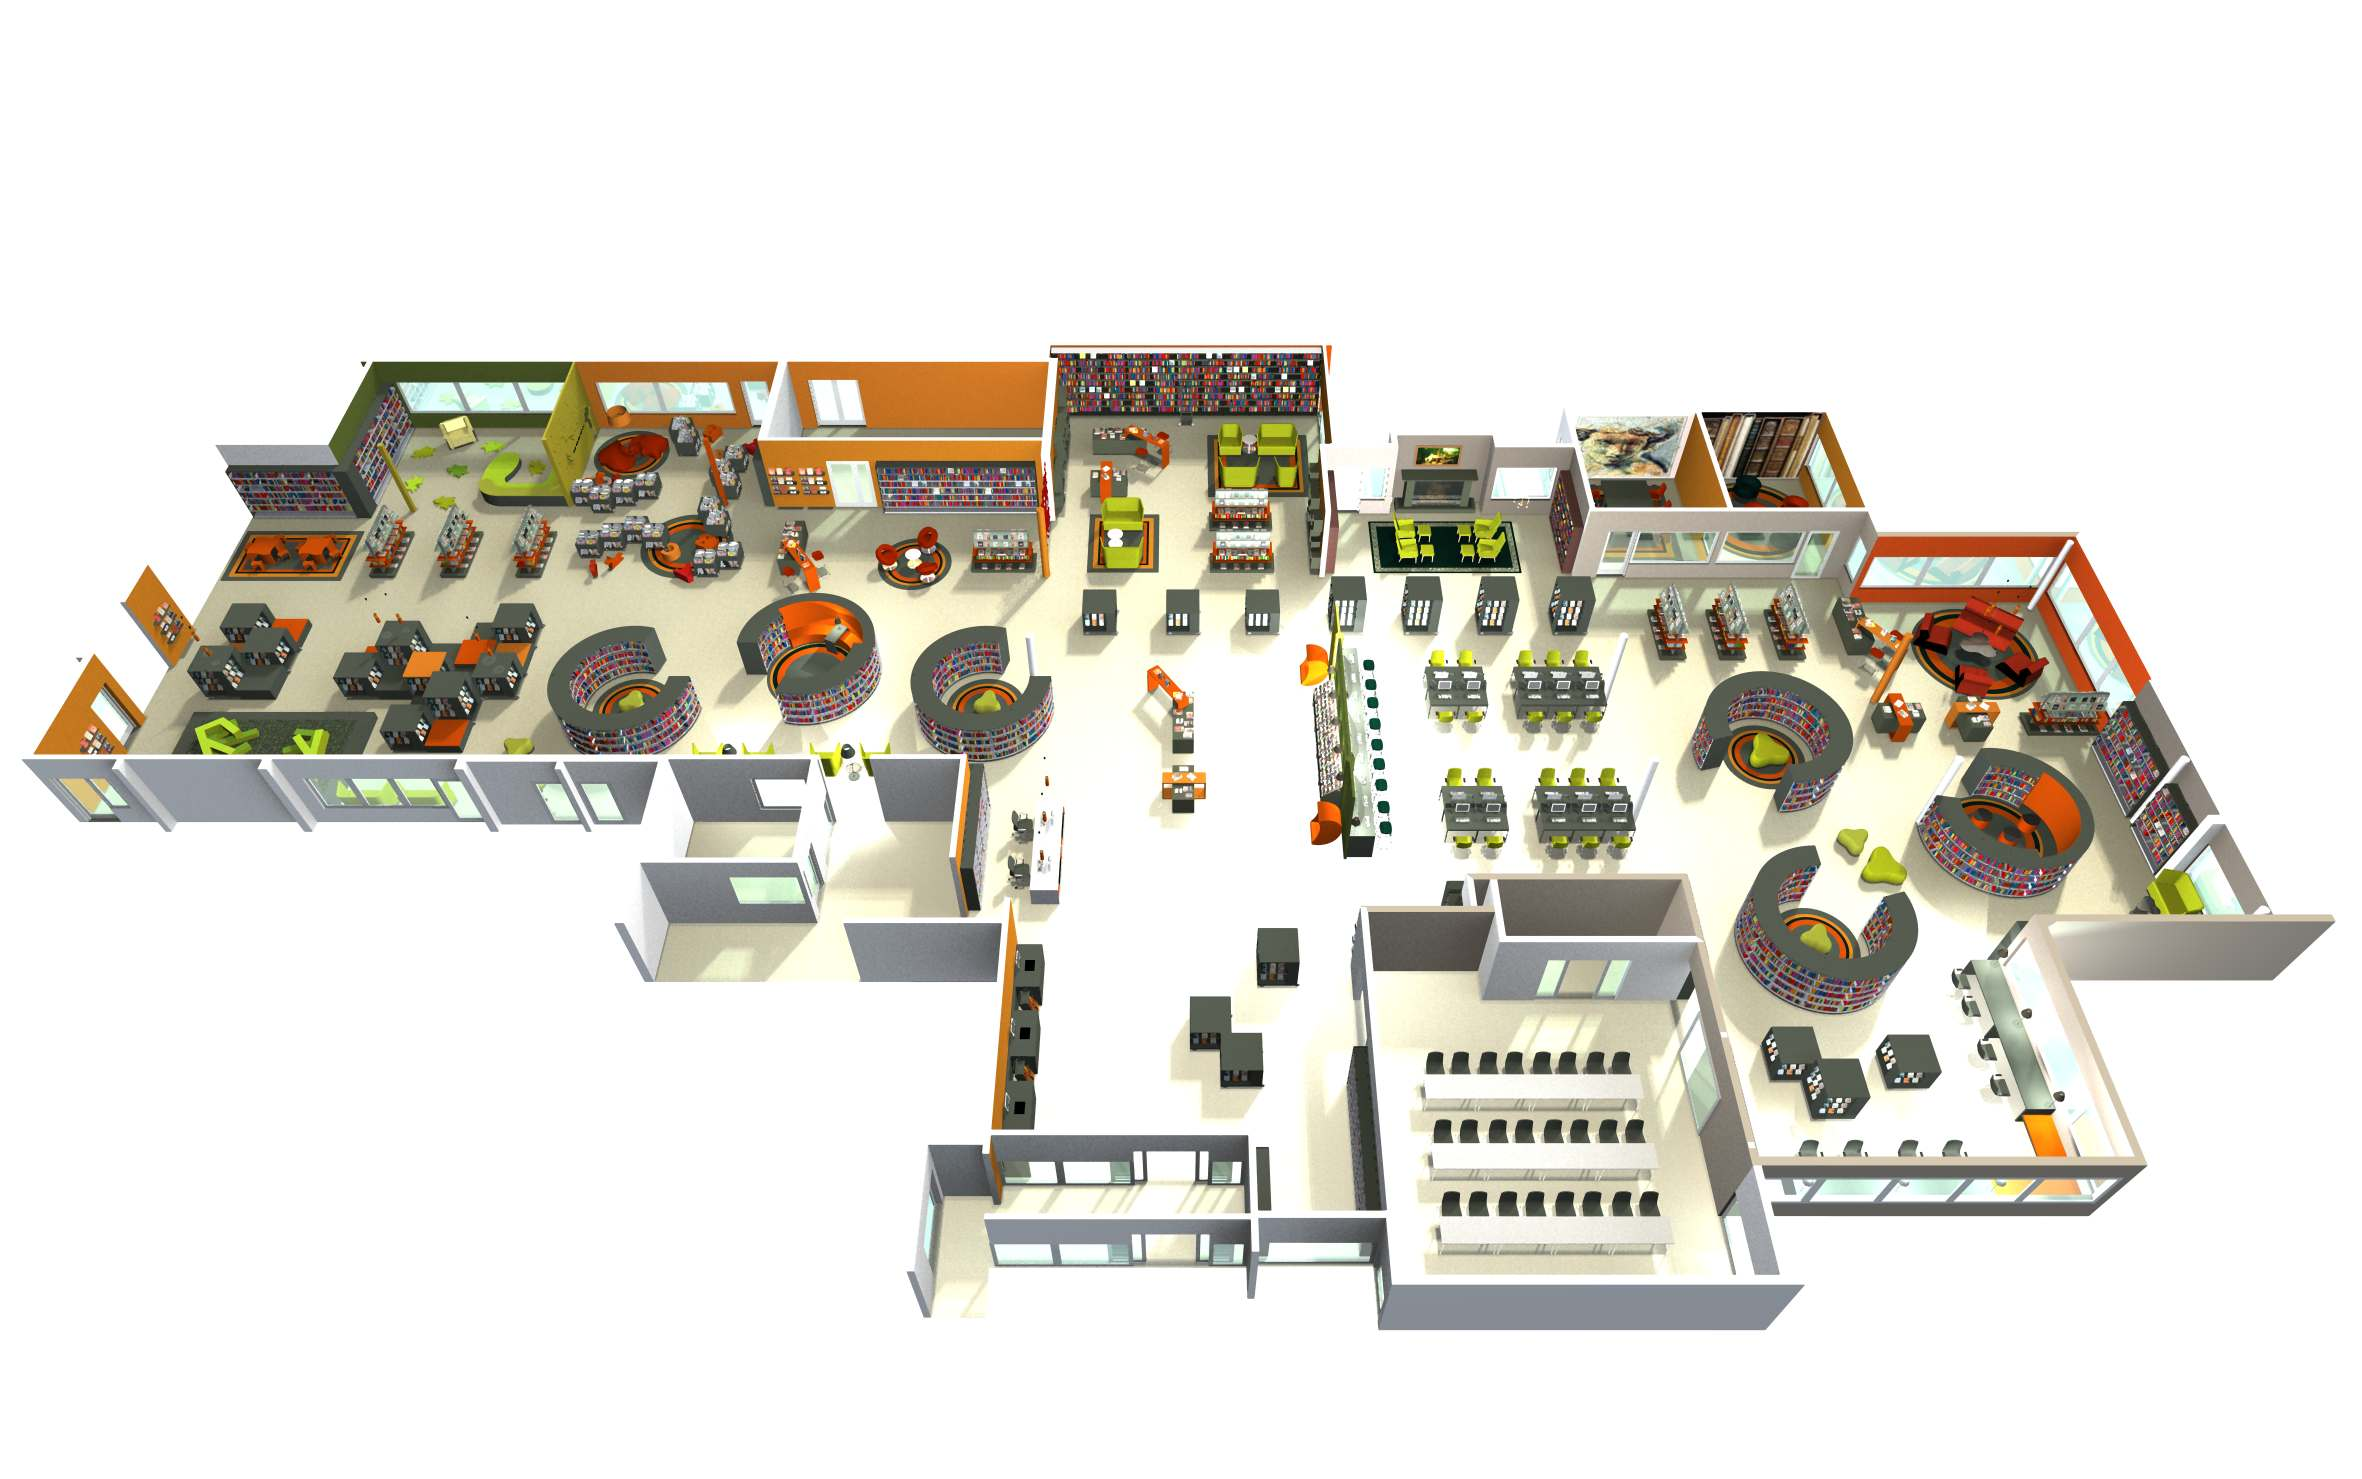 Library Interior Design Planning photo - 5